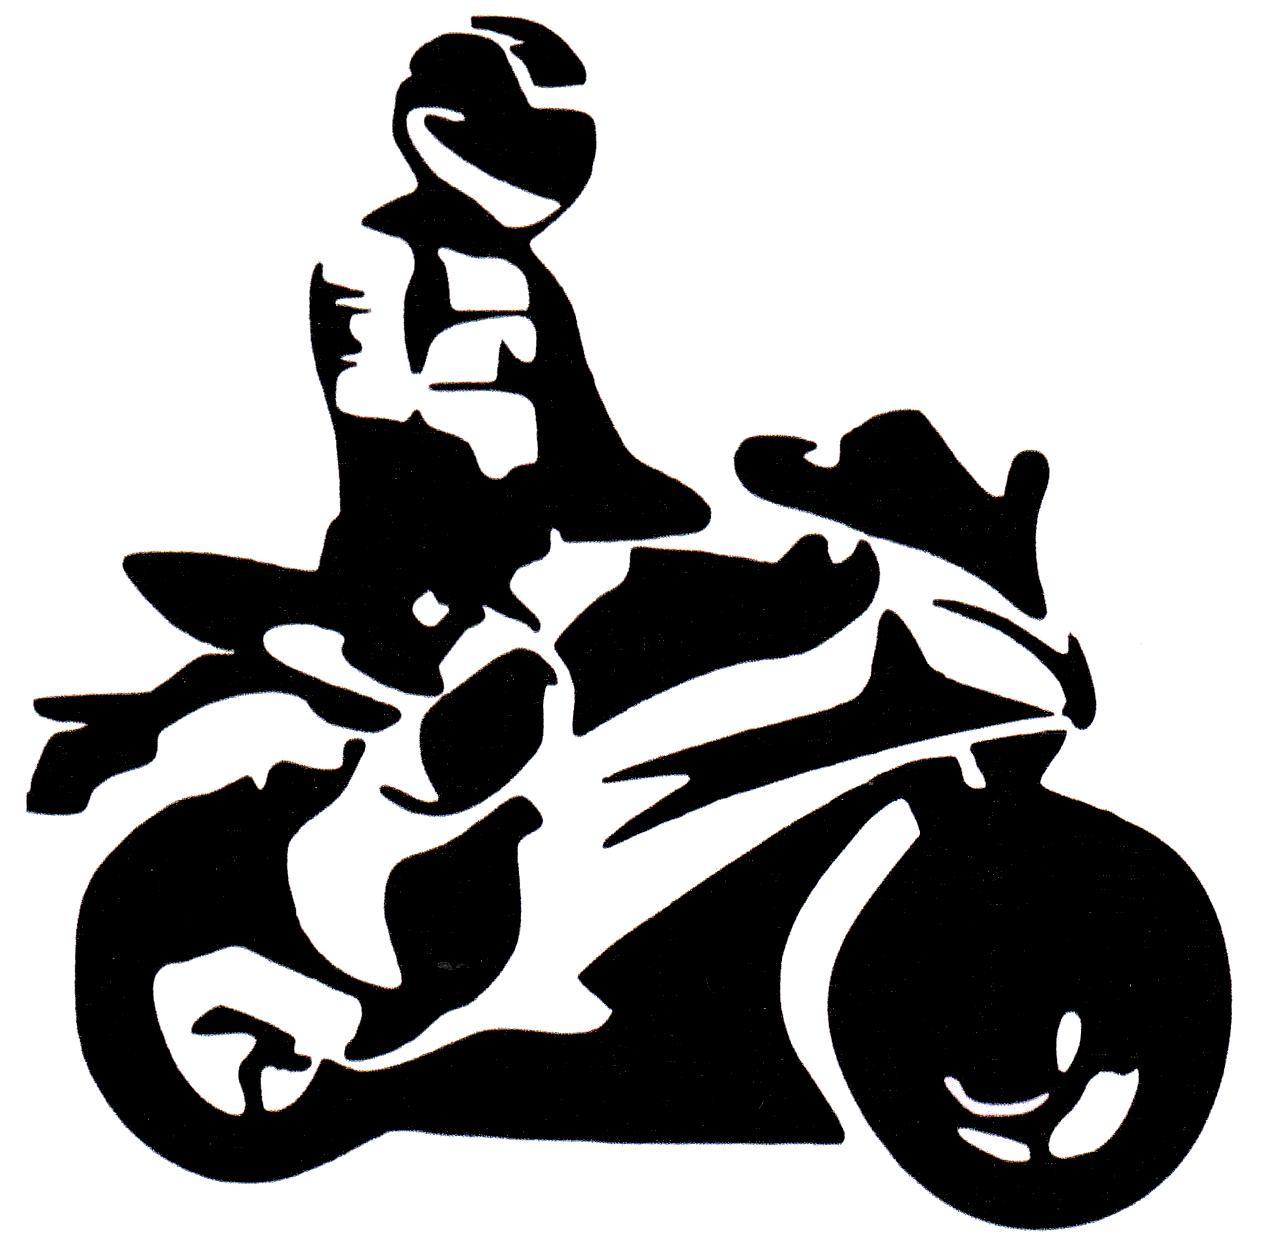 желание трафареты на мотоцикл картинки гармонично